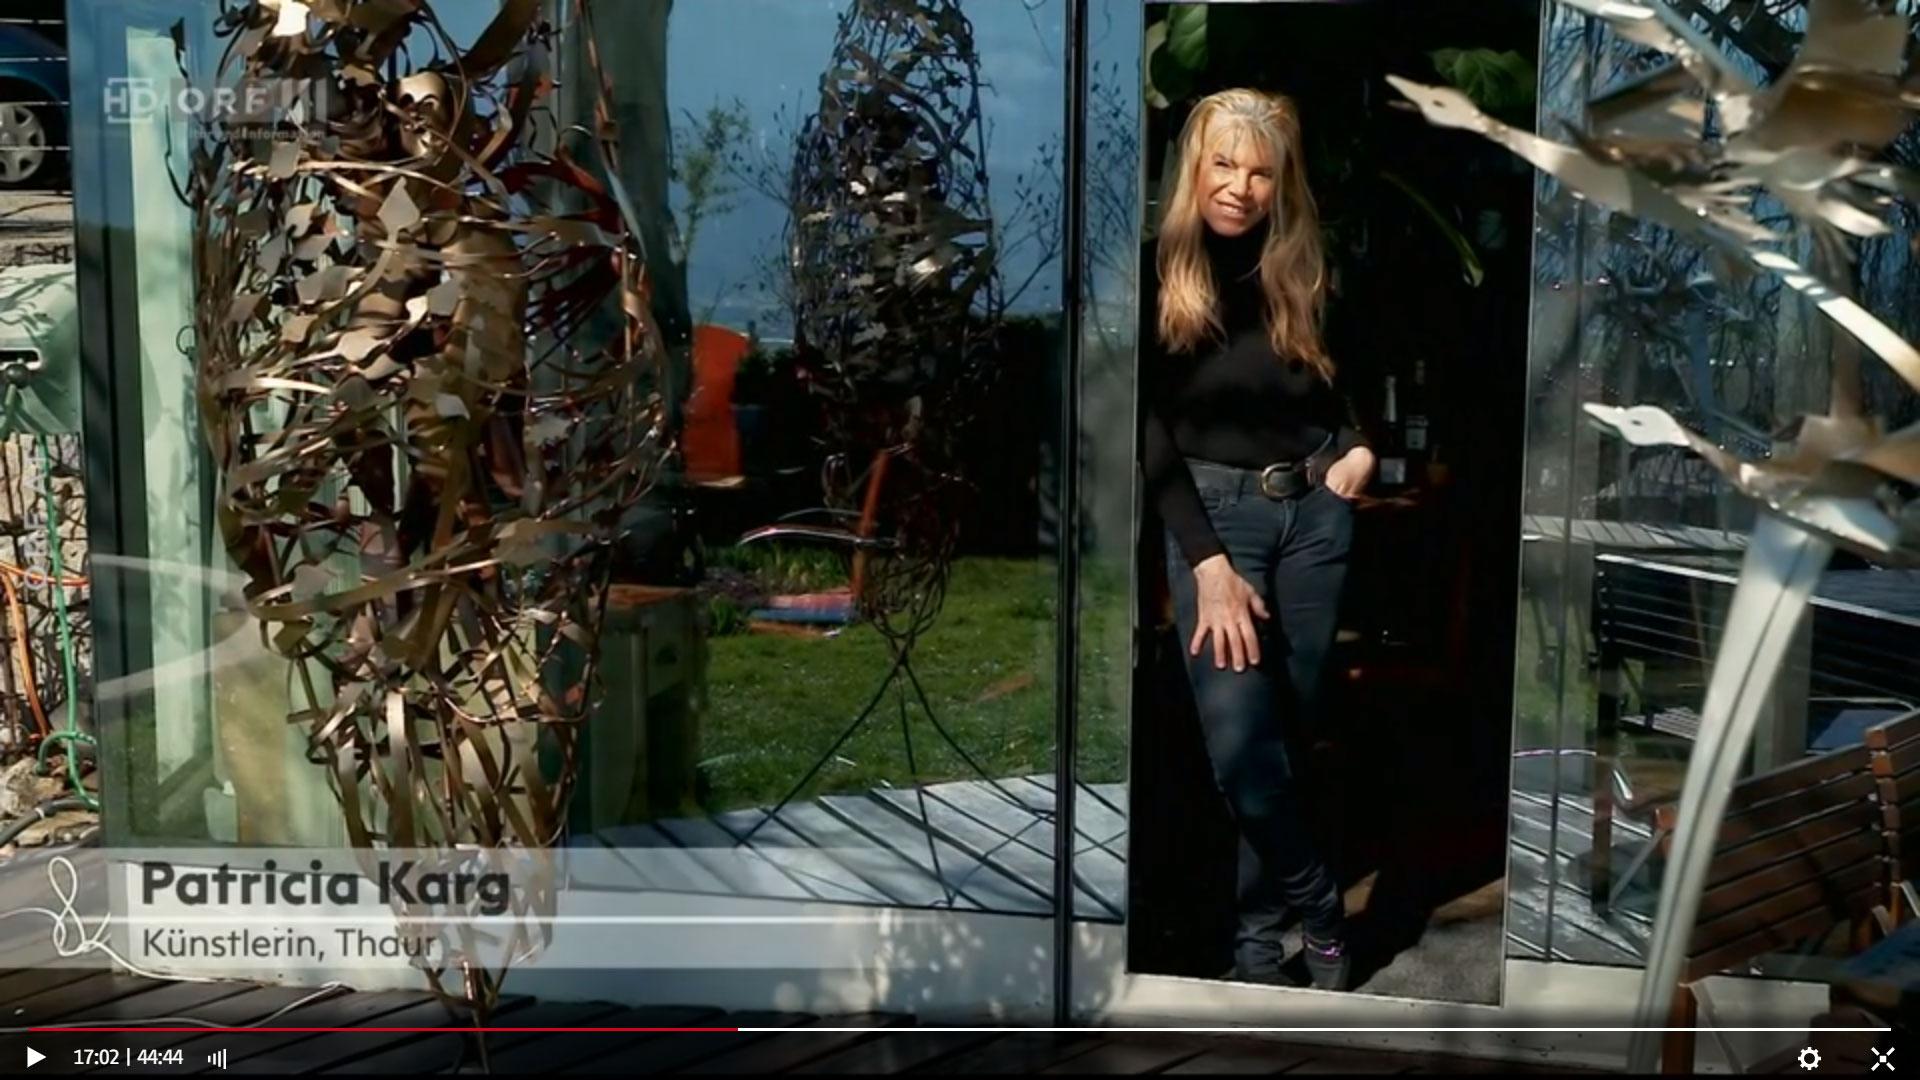 Interview_ORF-3_COVID-19_qualHoch